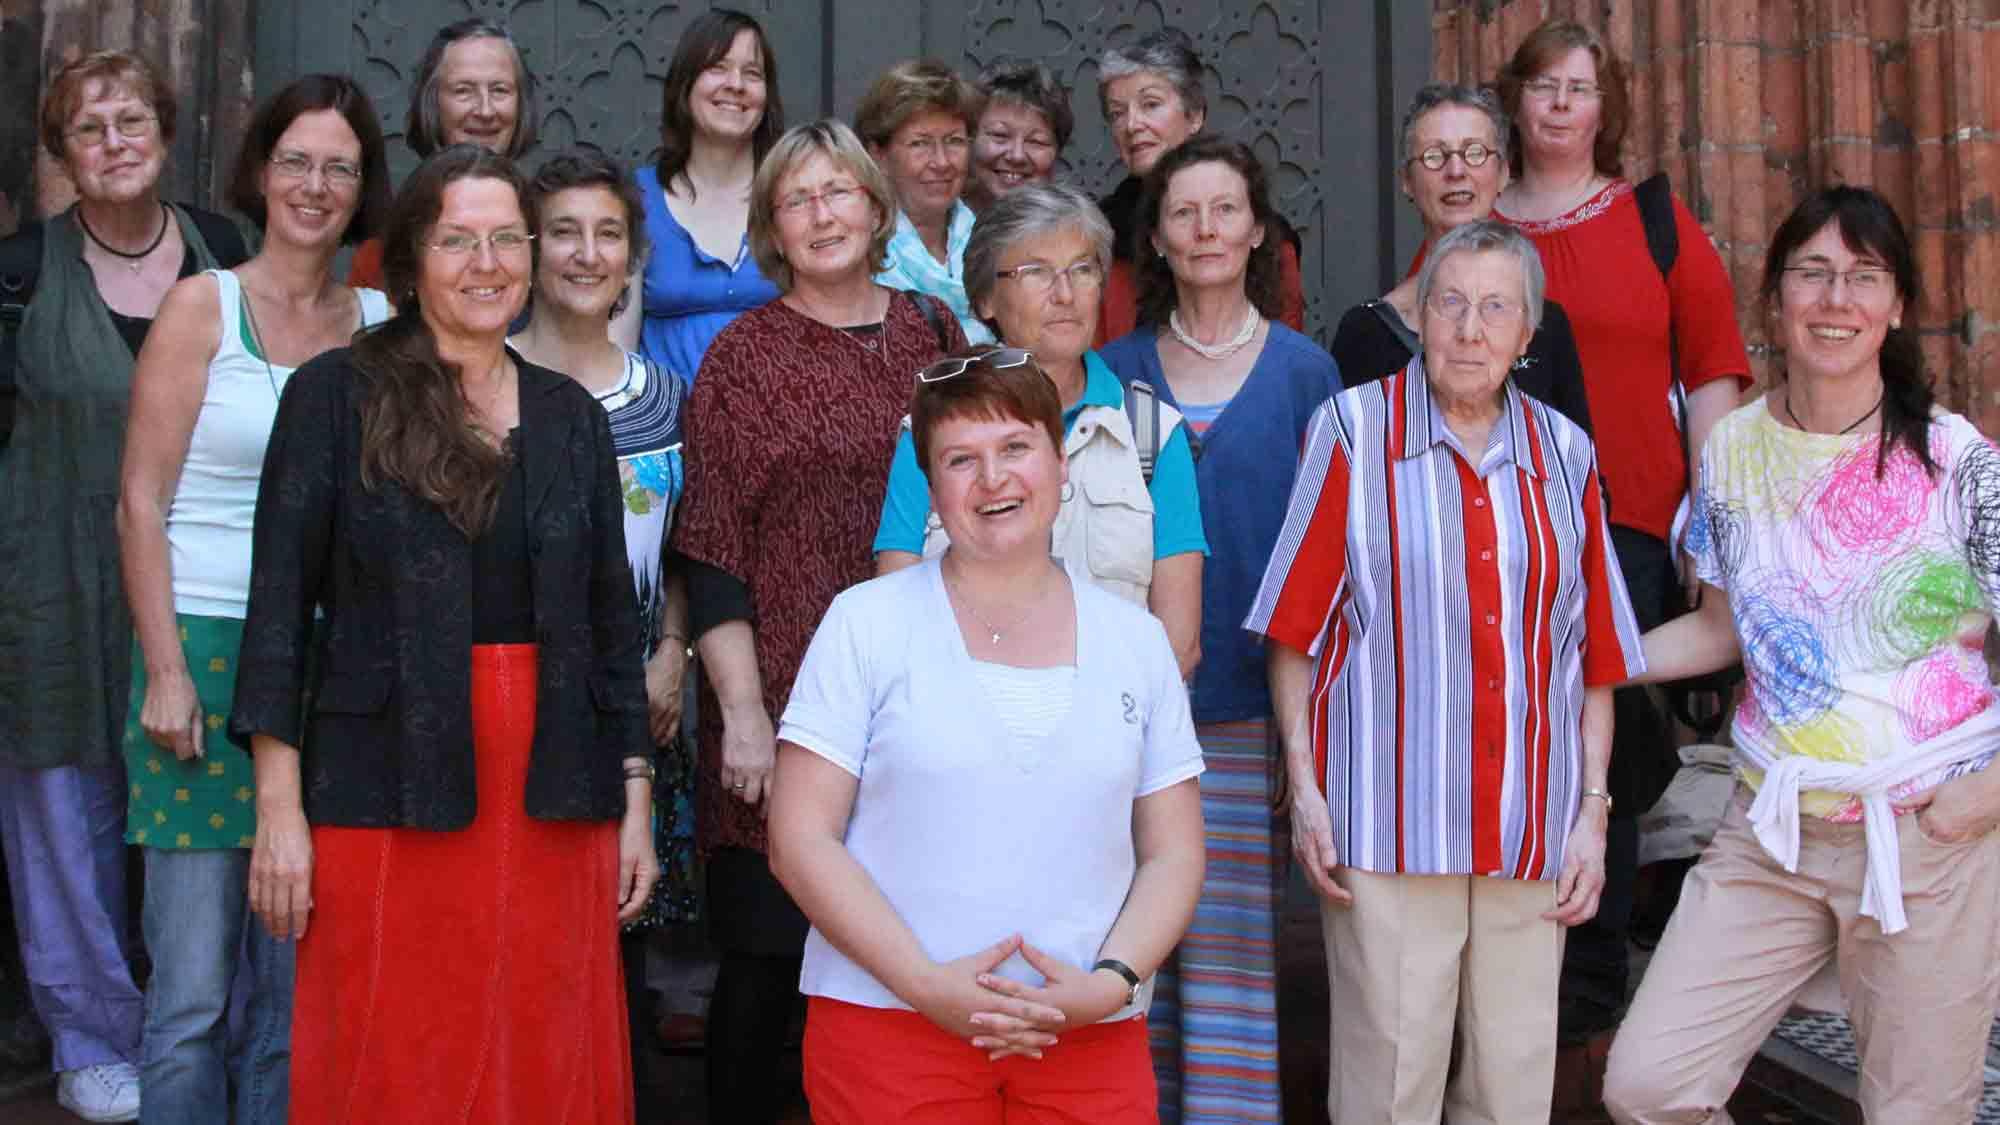 Frauengruppe vor dem Brandenburger Dom, Copyright: Heike Schulze